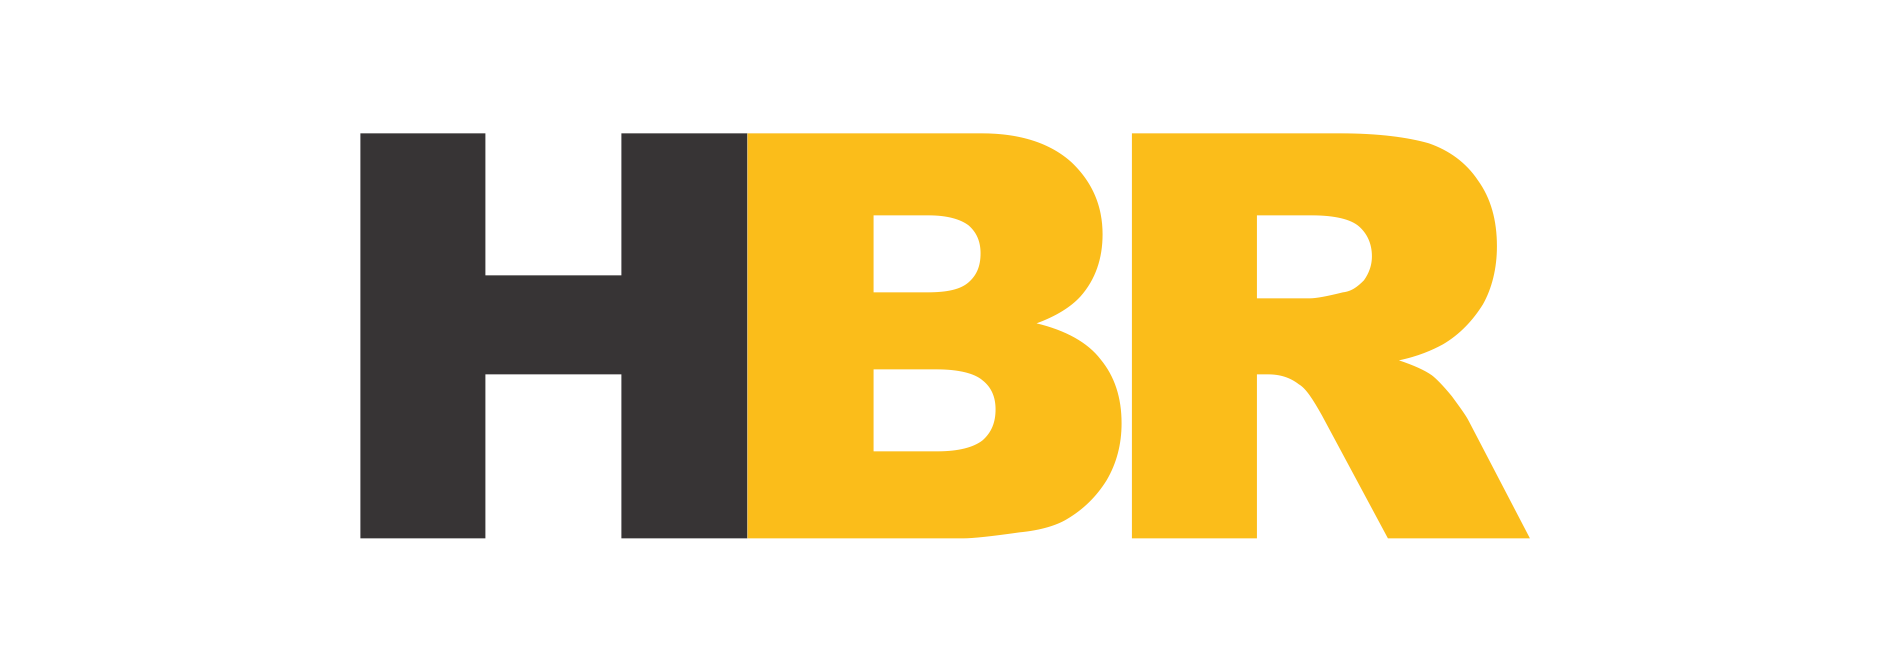 https://www.abraphe.org.br/wp-content/uploads/2018/05/logo_hbr.png